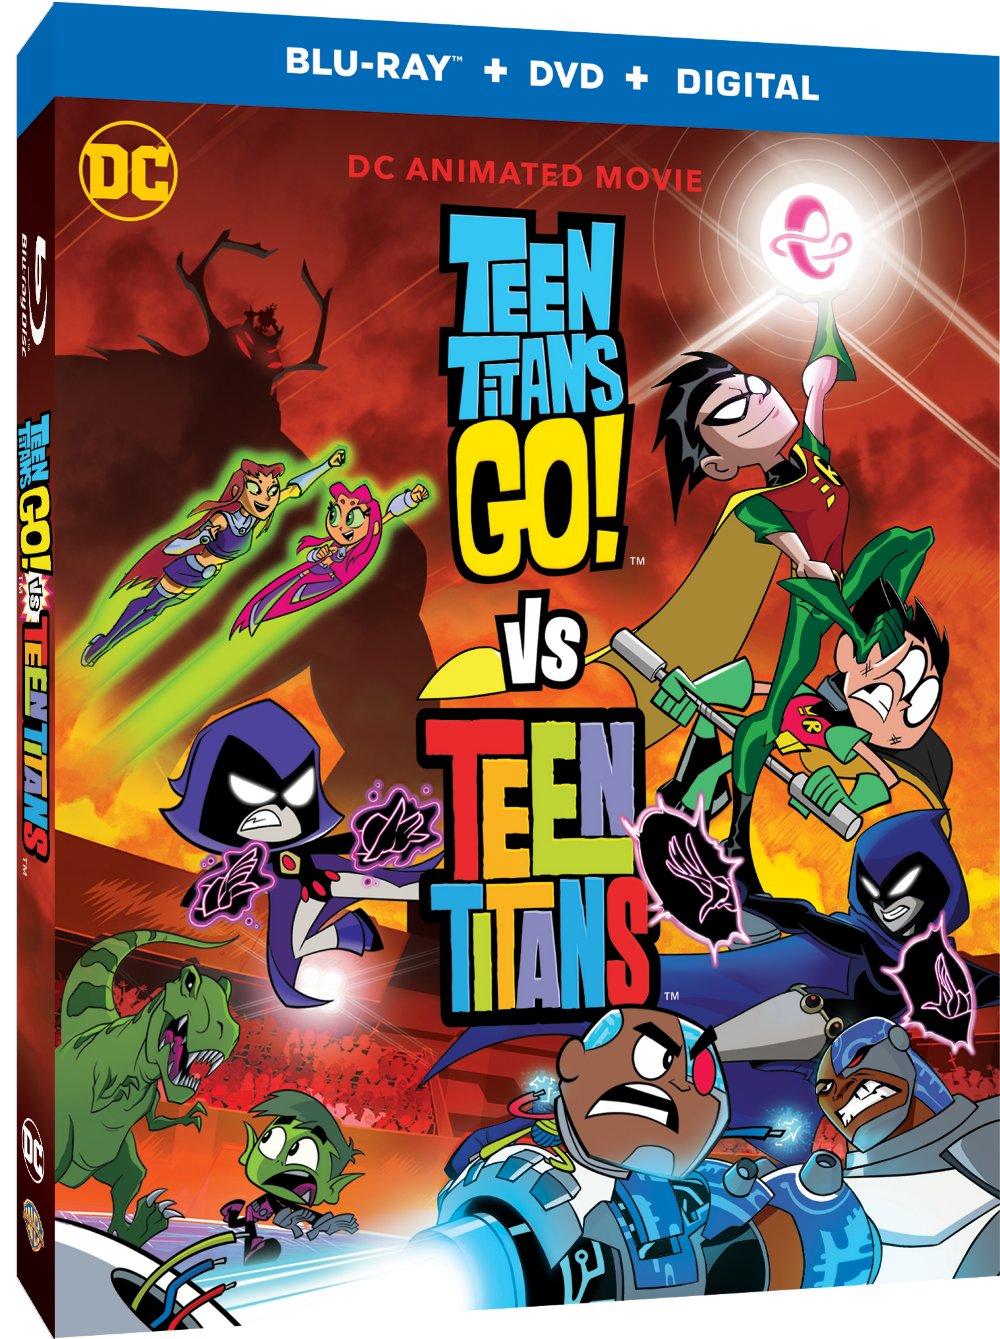 Teen Titans Go! Vs Teen Titans Blu-ray/DVD